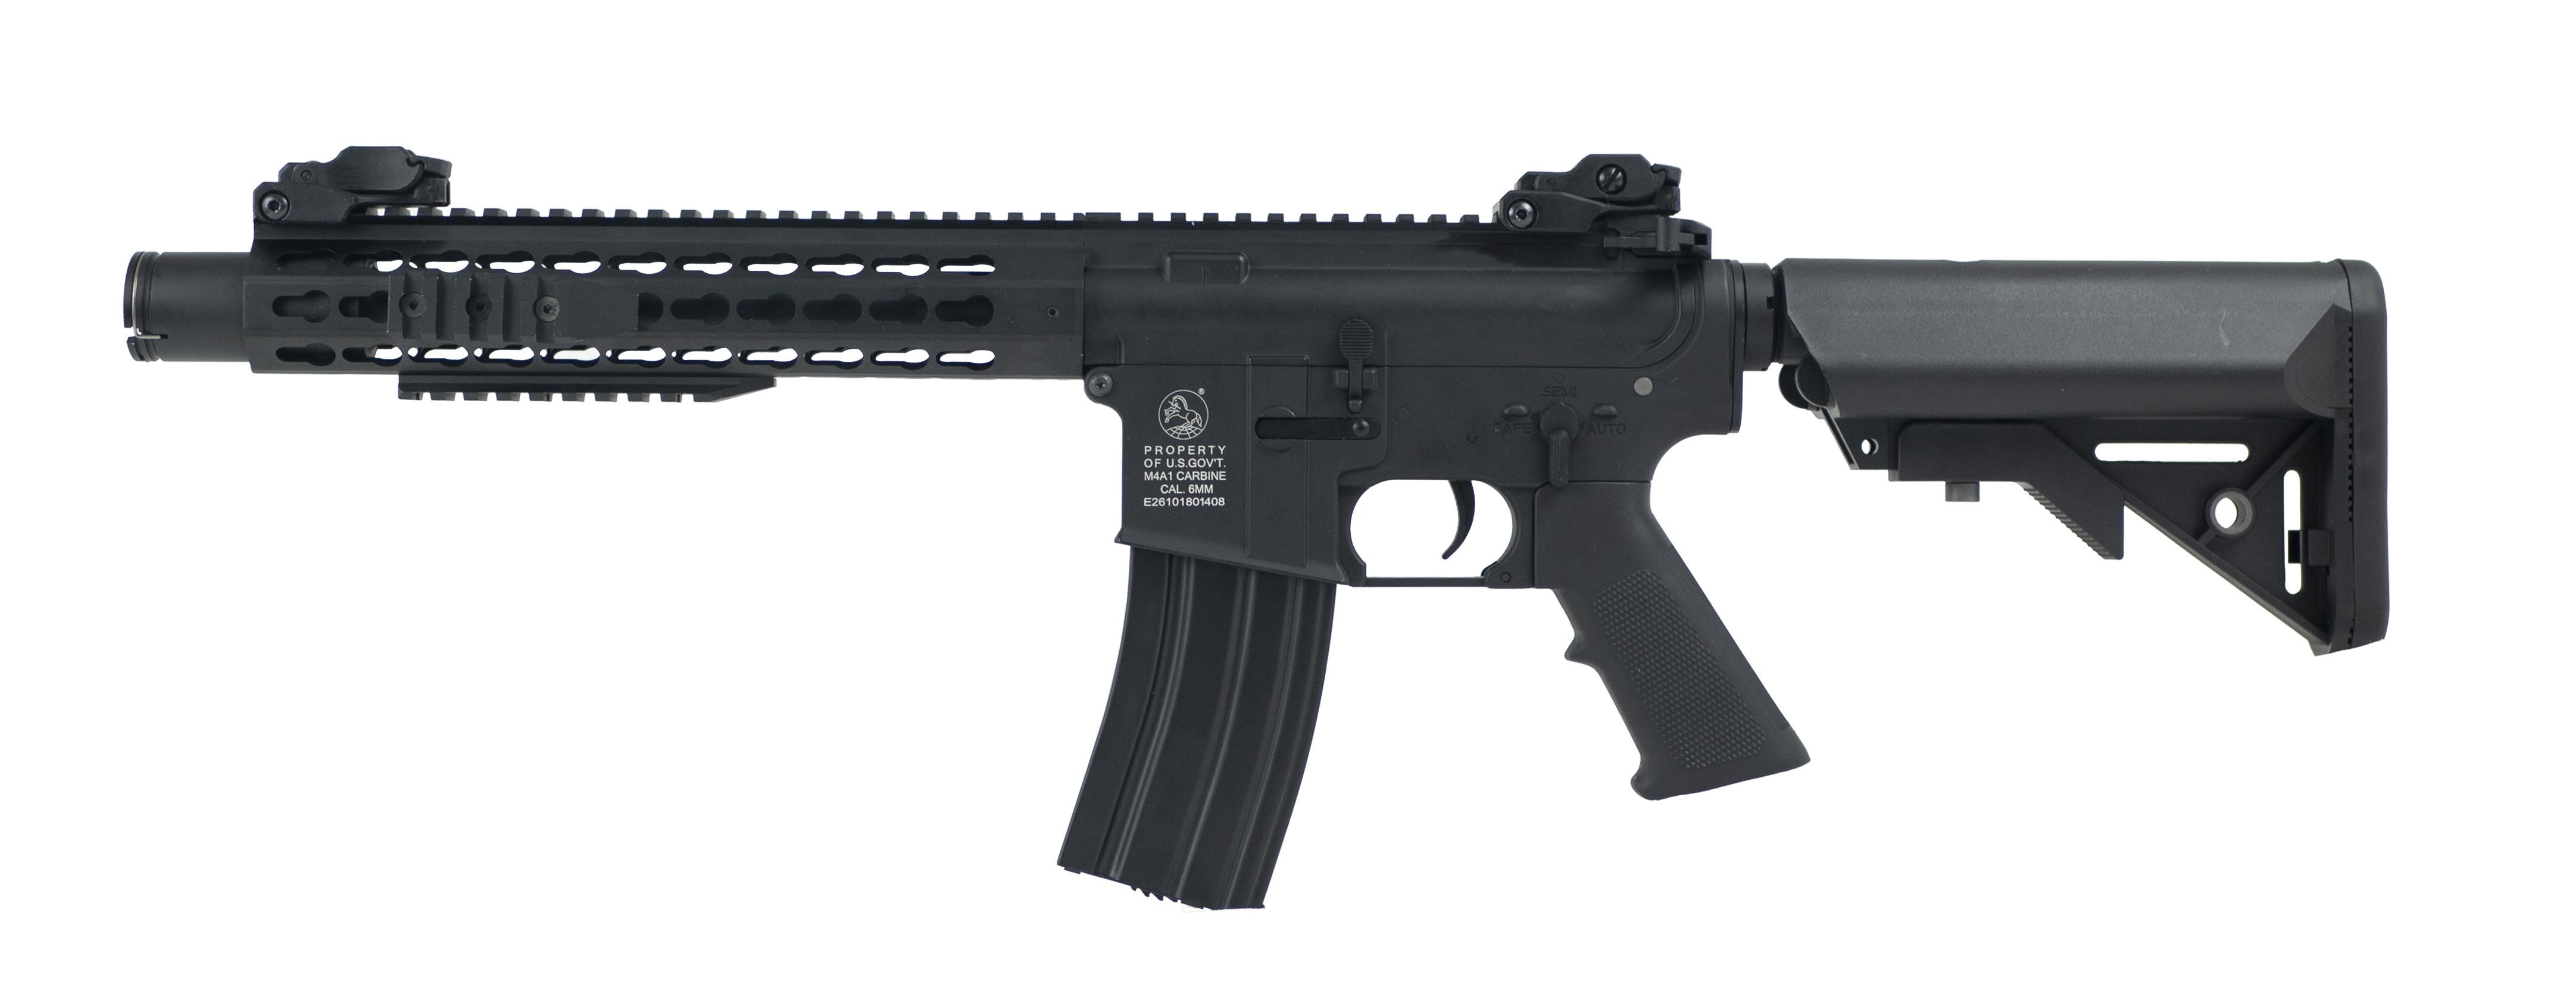 "Cybergun - Carabine ""Colt"" M4 Keymod Blast Full Metal AEG - Noir (1.1 joules)"